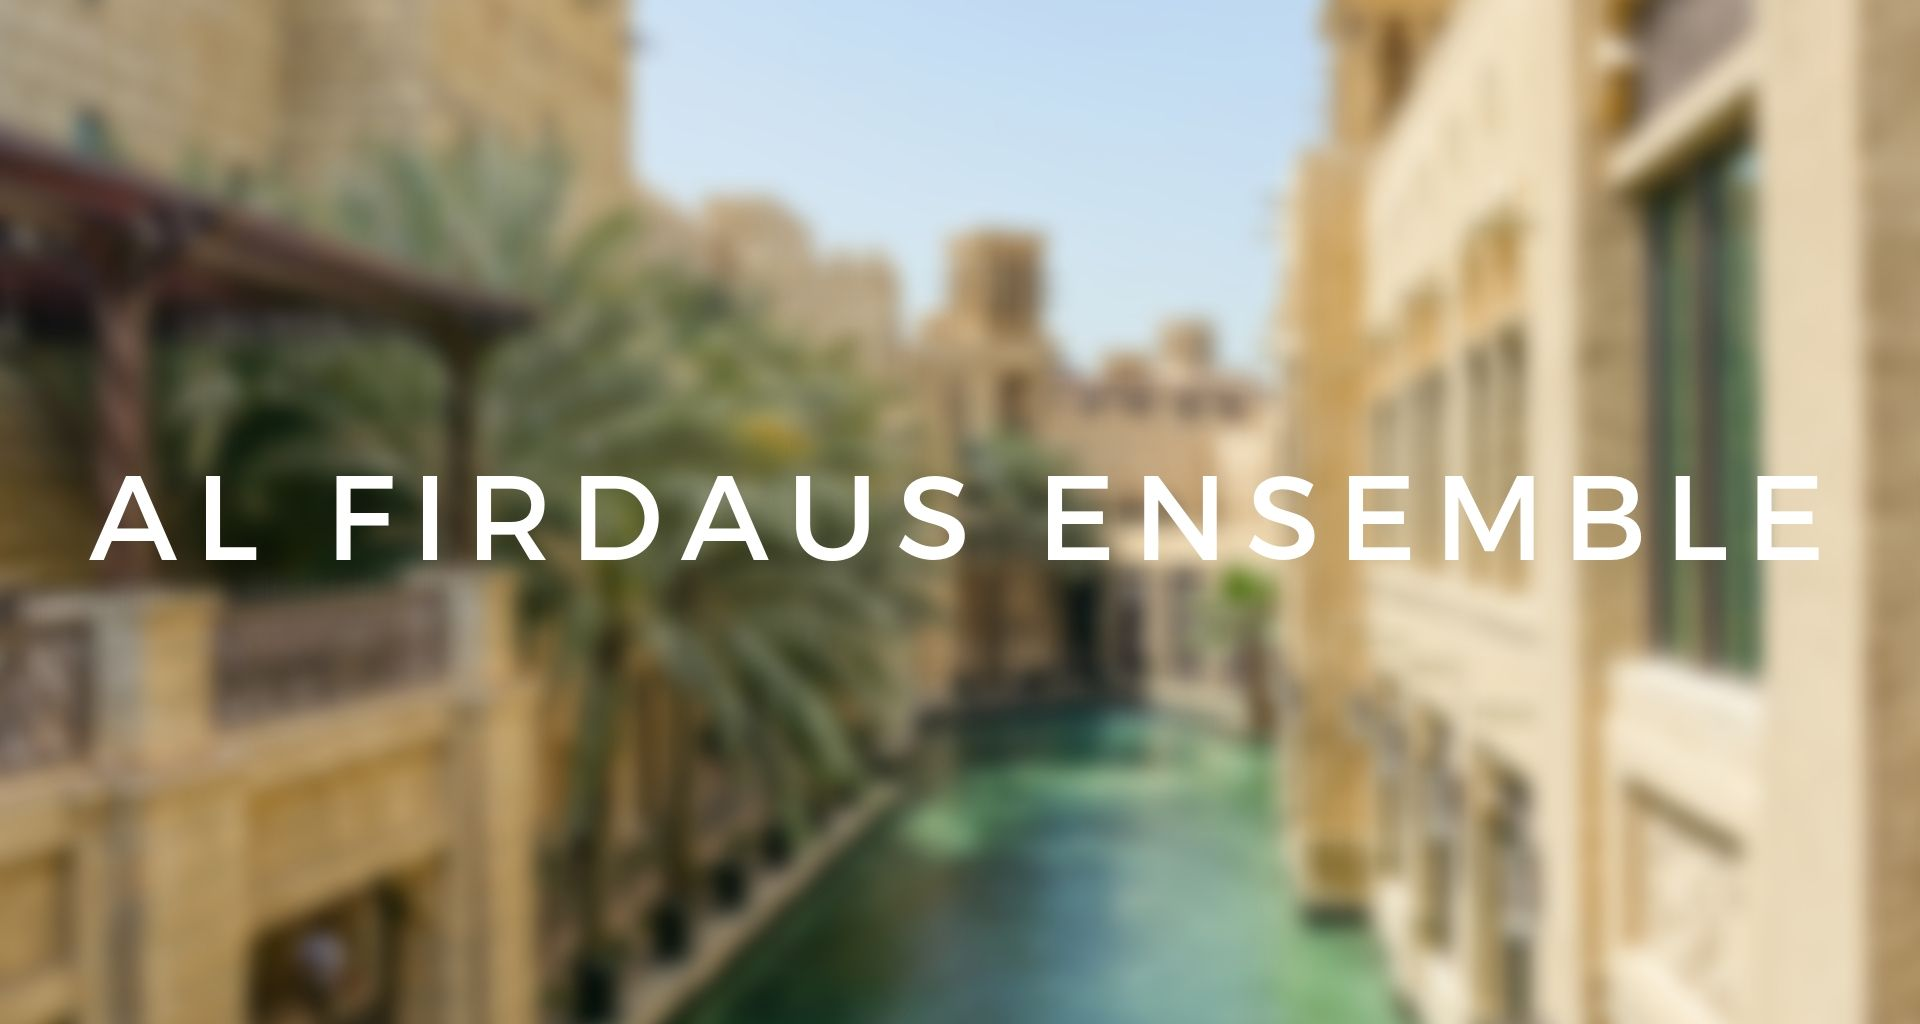 Top Event - Al Firdaus Ensemble